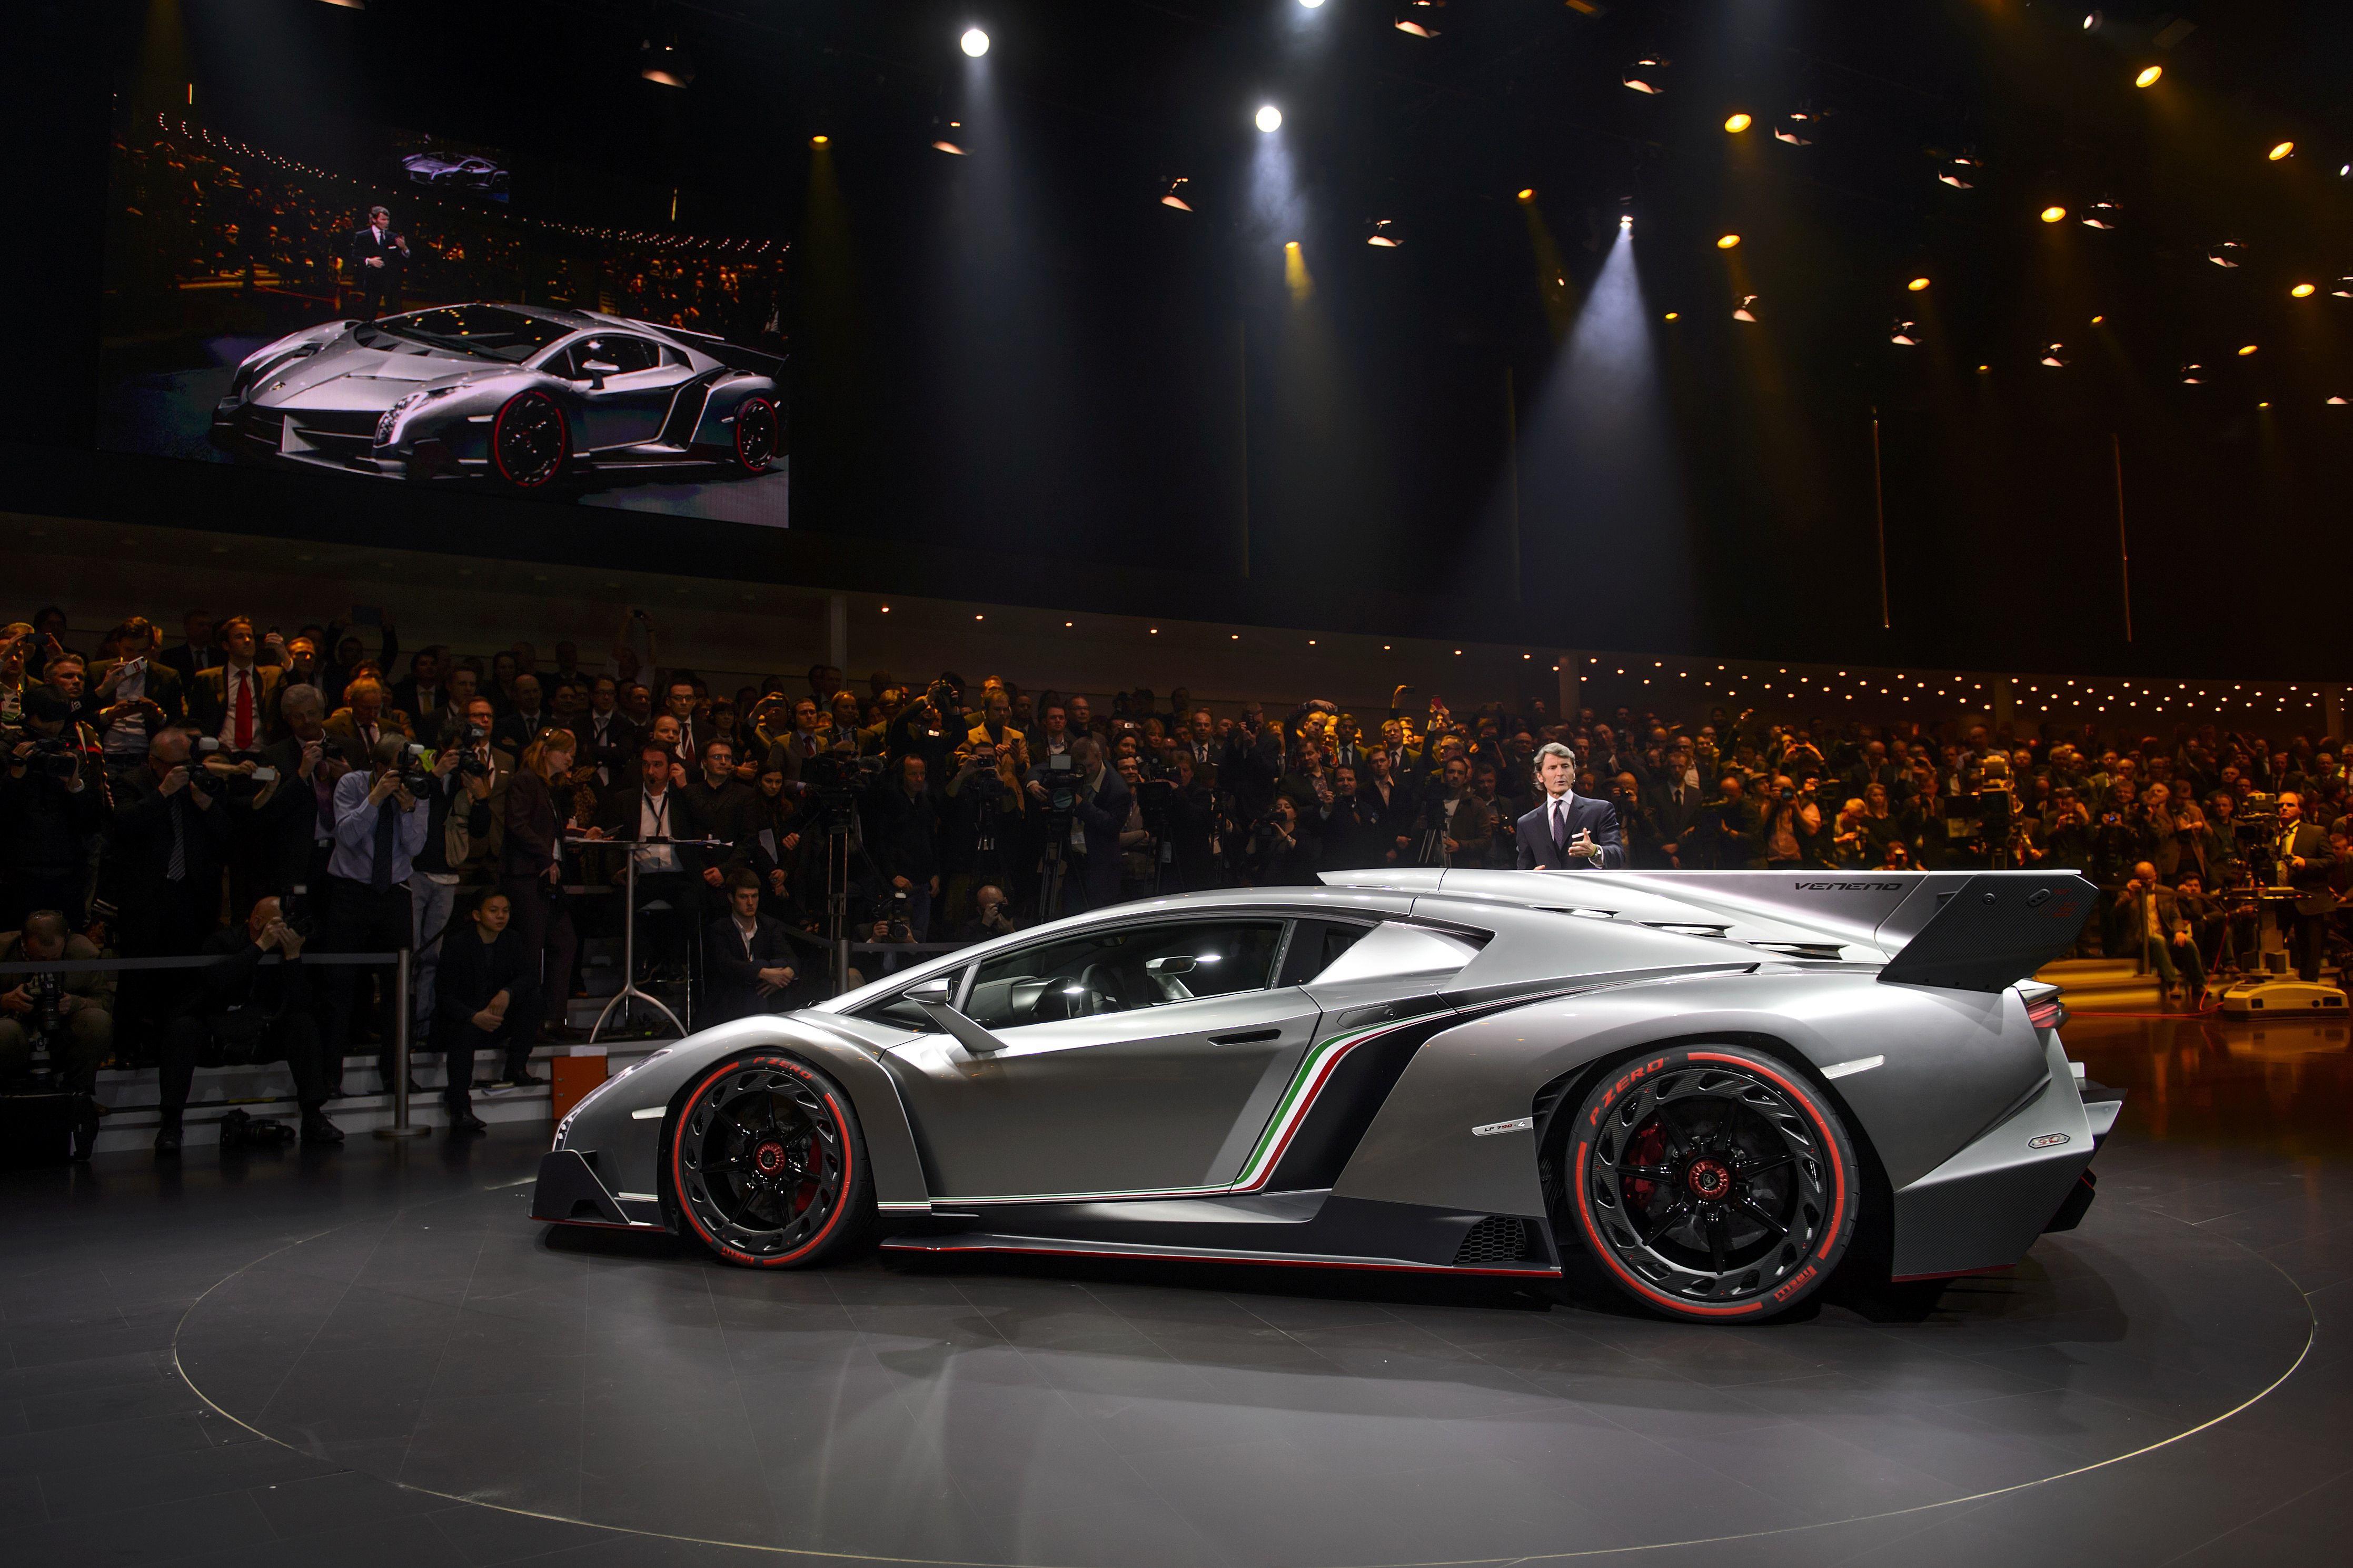 Photos Lamborghini S New 3 9 Million Veneno Supercar Lamborghini Veneno Super Cars Lamborghini